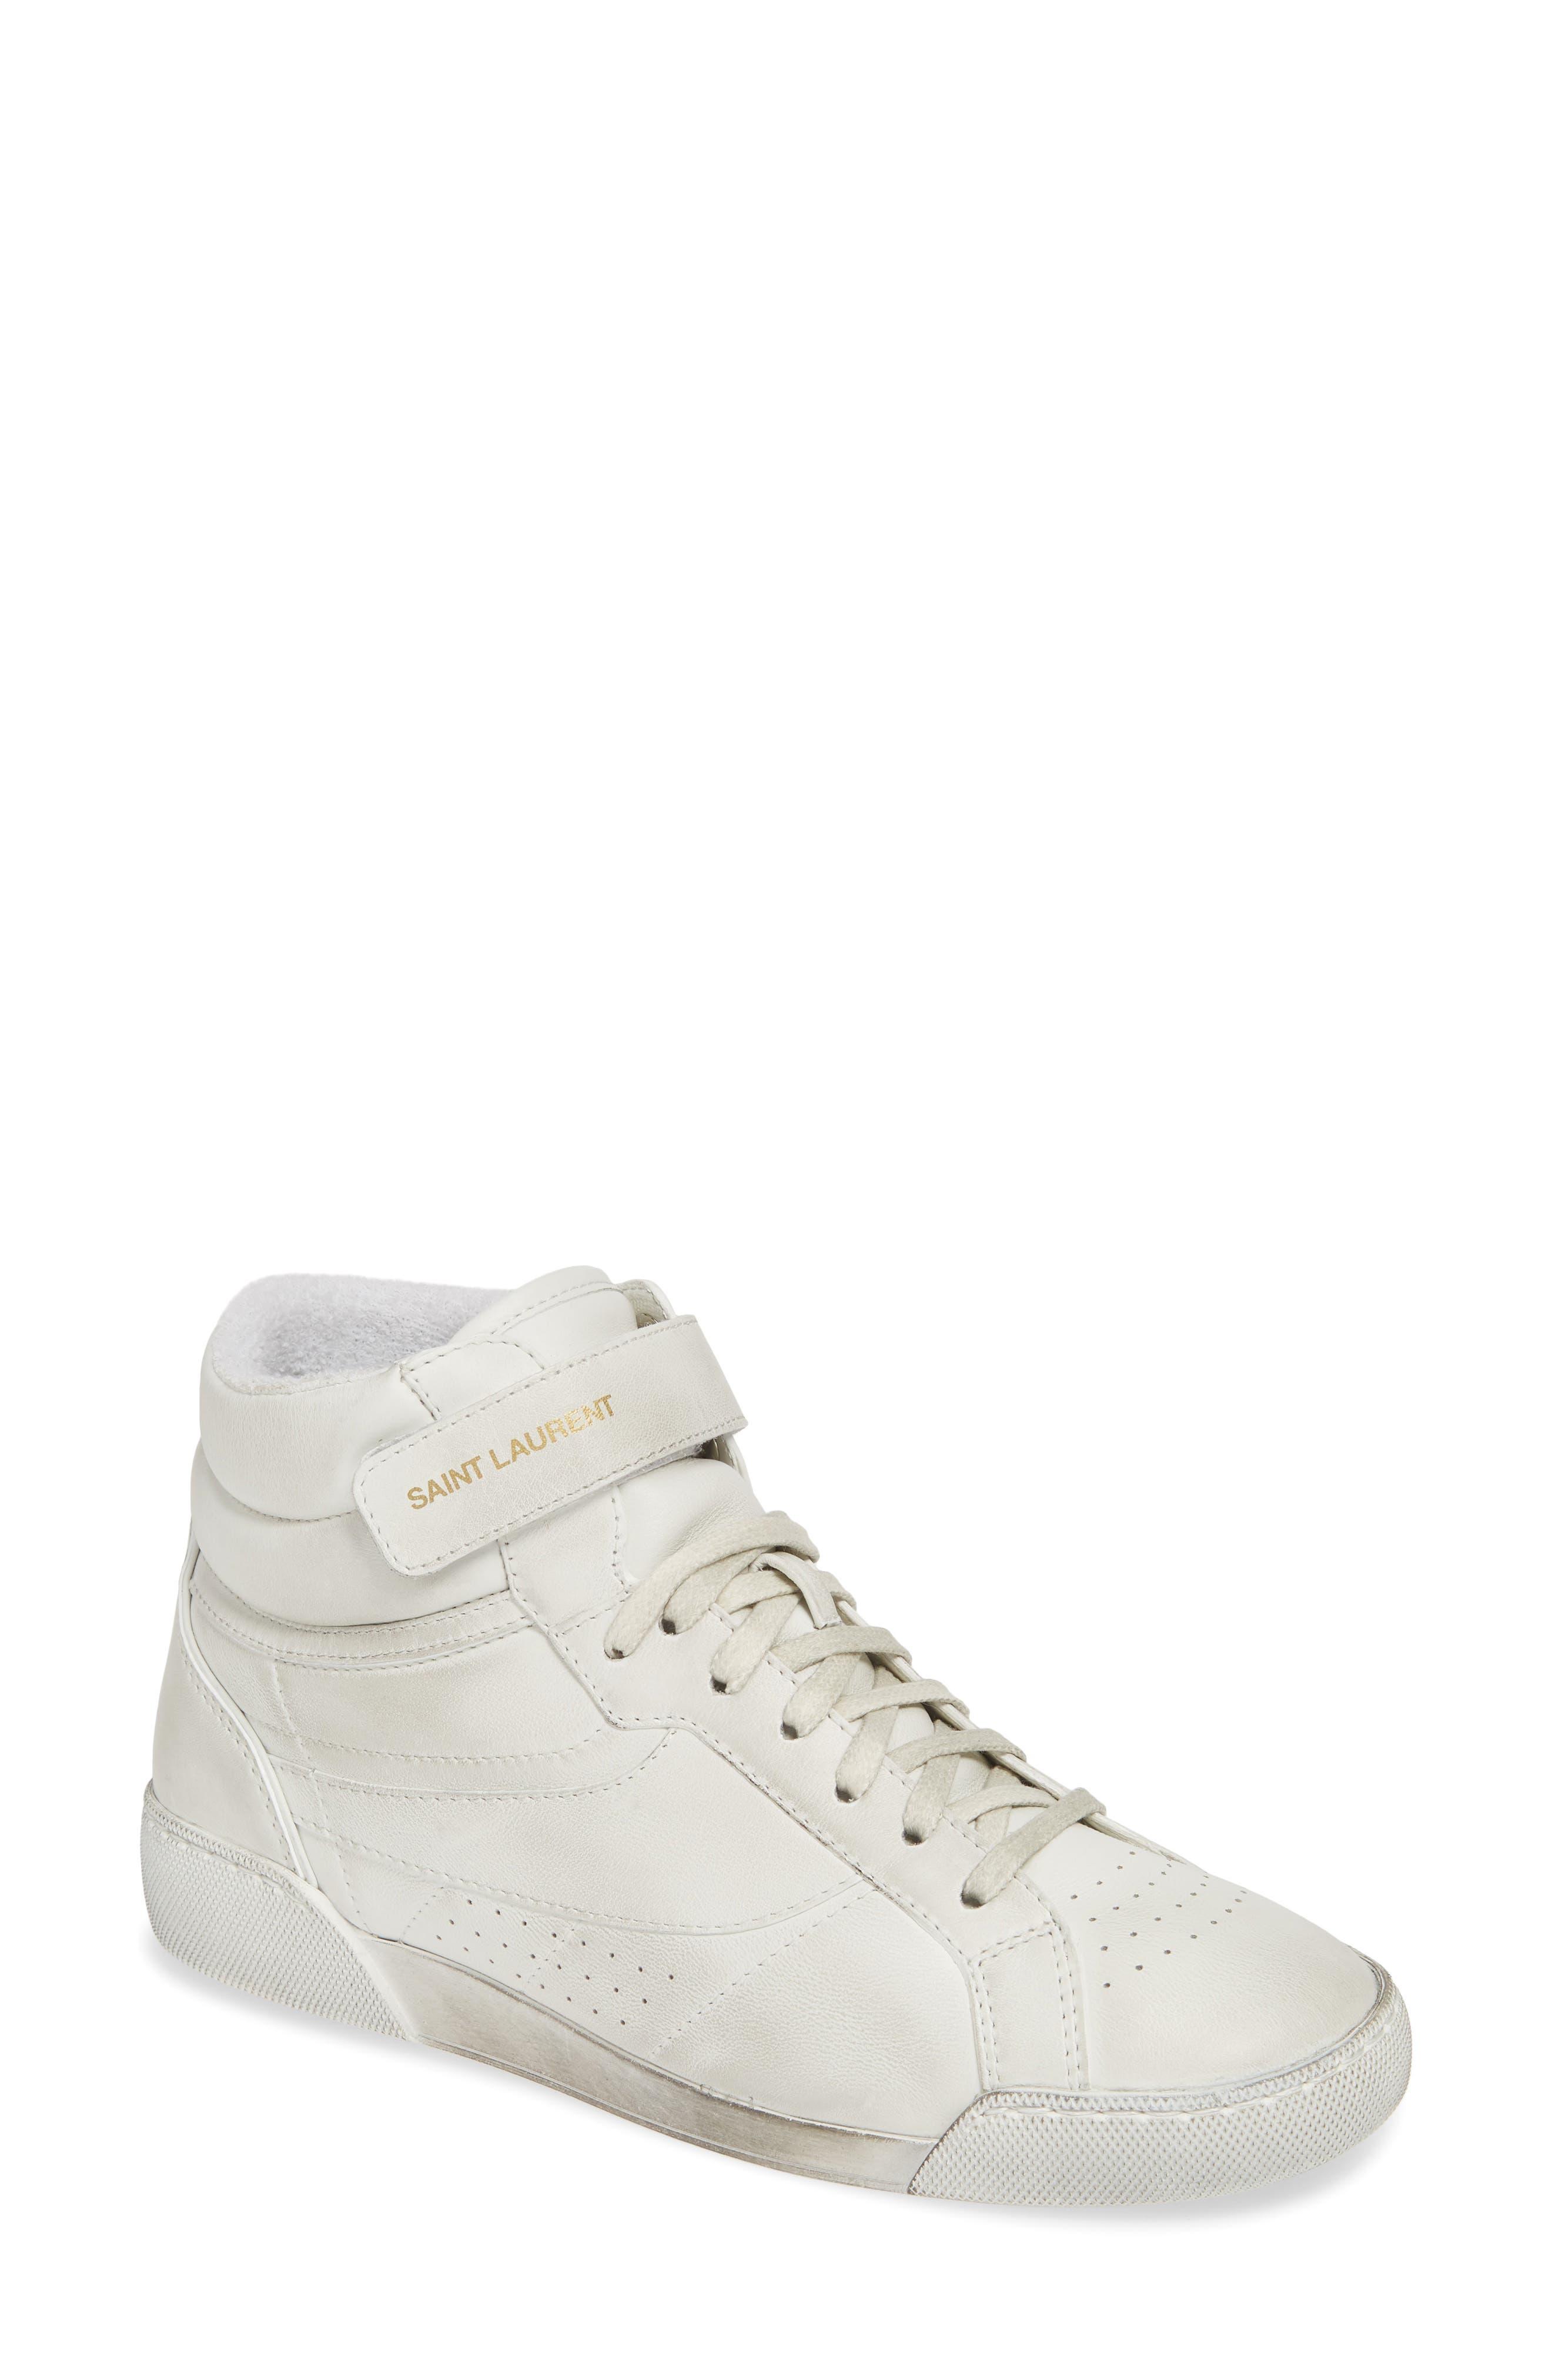 Saint Laurent Lenny Mid-Top Sneaker